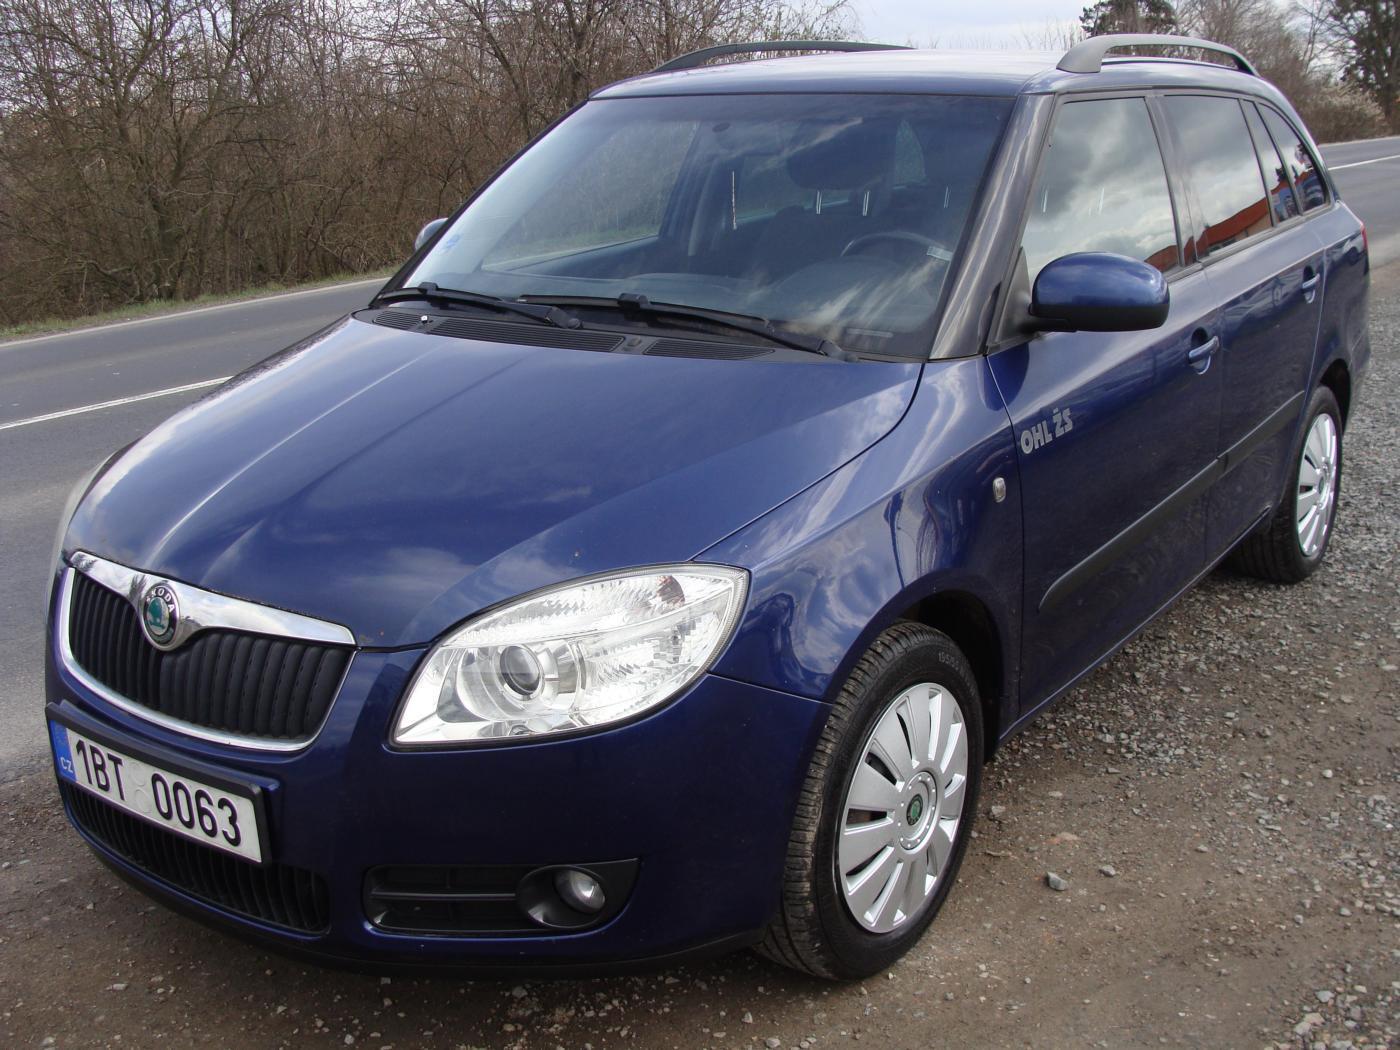 Škoda Fabia 1.4i, Kompletní serviska kombi